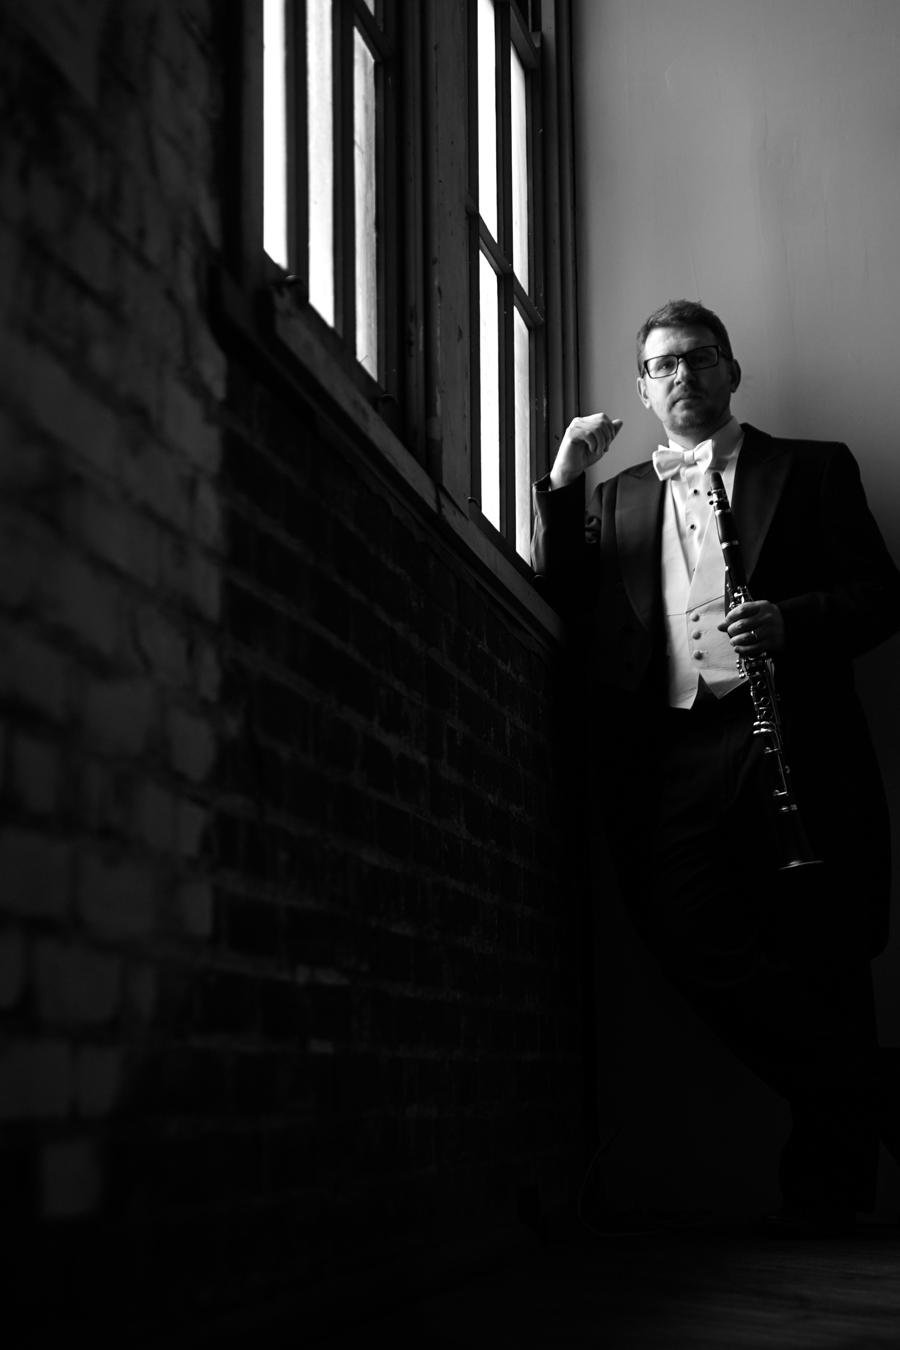 Matthew Nelson Clarinet by Tina Gutierrez 47Re